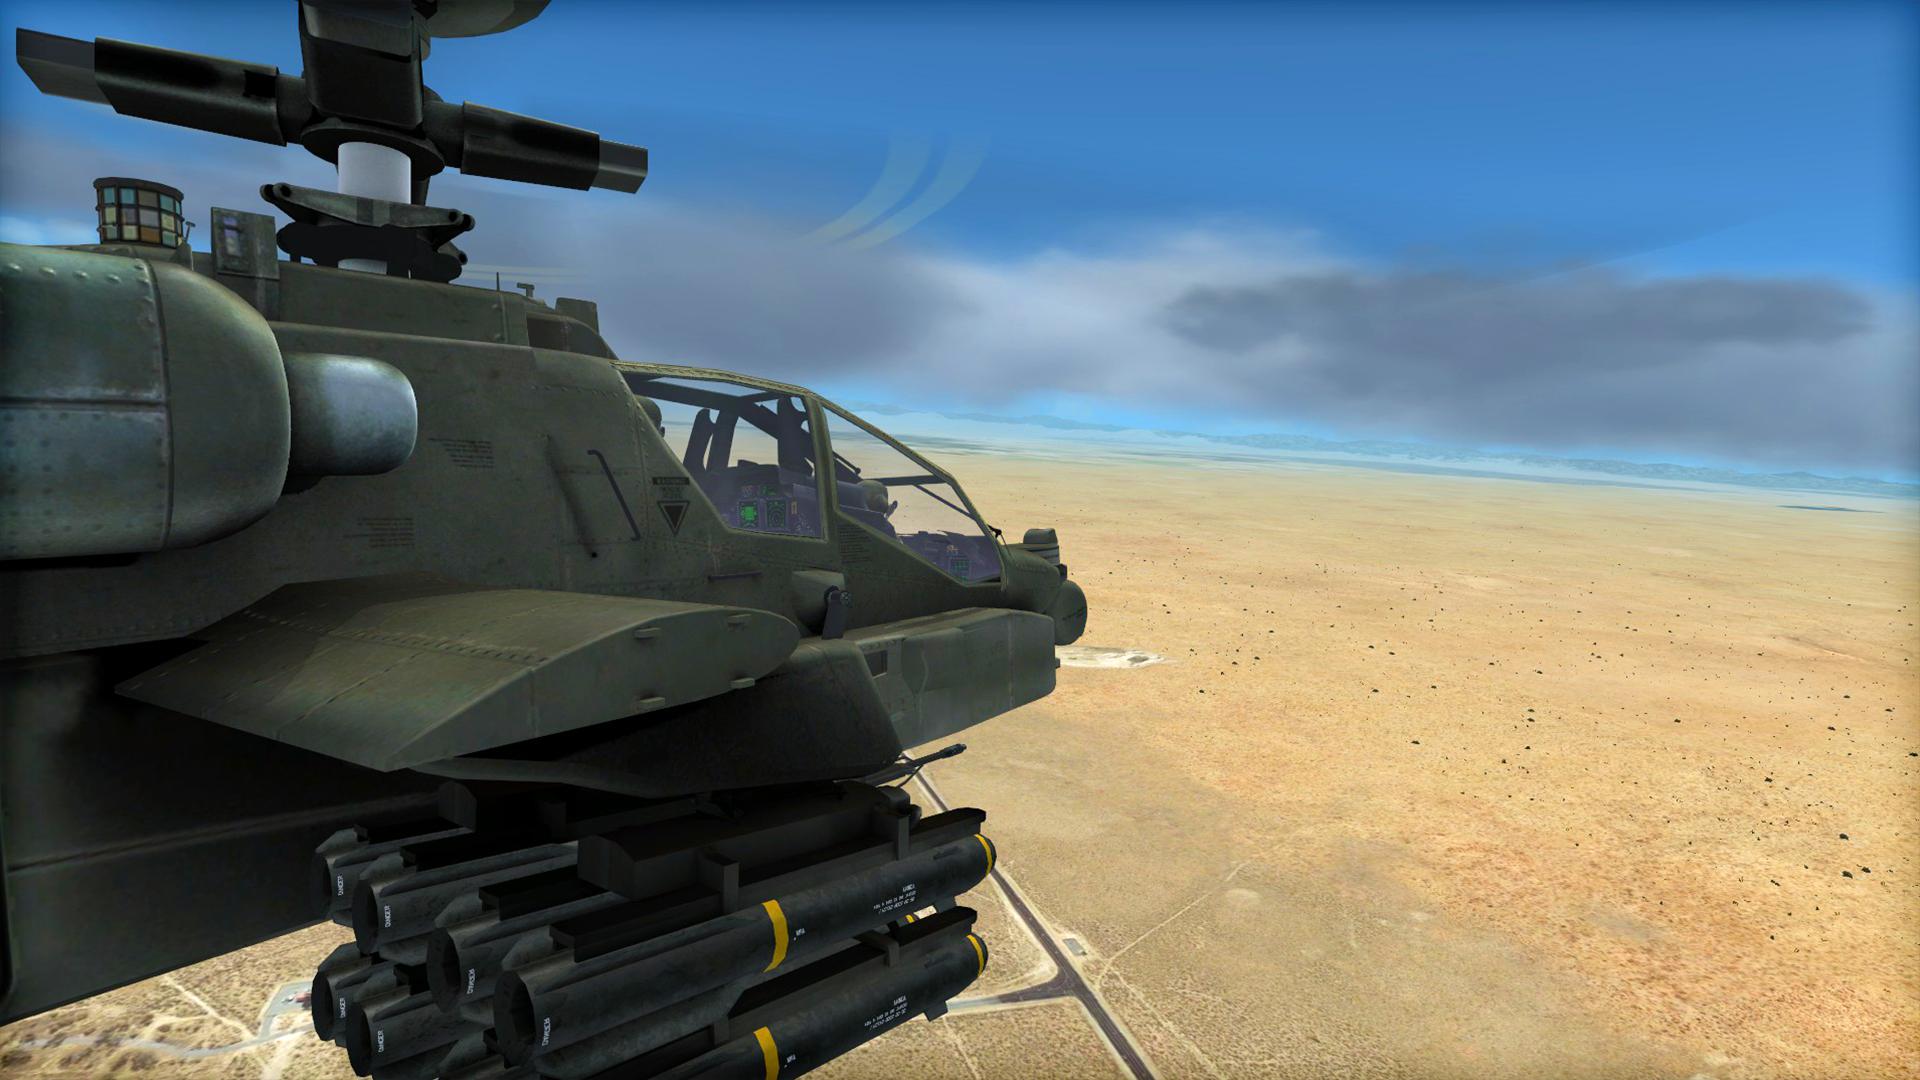 Dec 16, 2016 AH-64D Apache Longbow™ out now for FSX